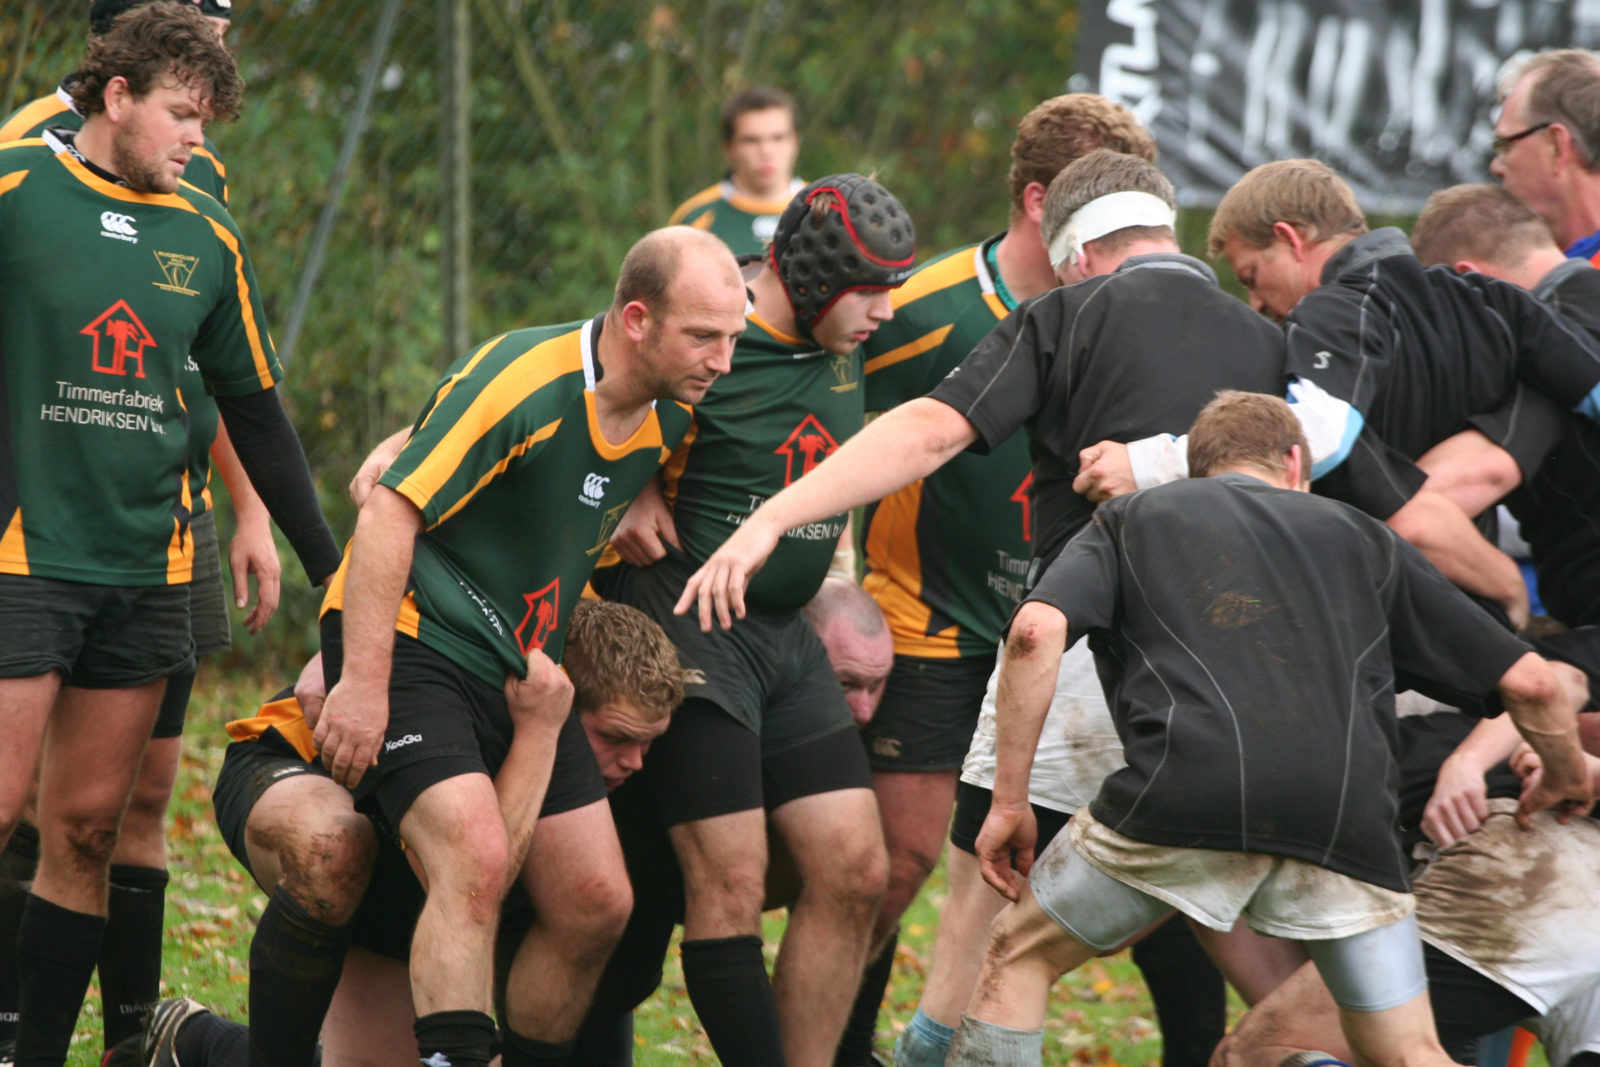 2010-11-06 | RCS2 – The Wild Rovers | 12-31